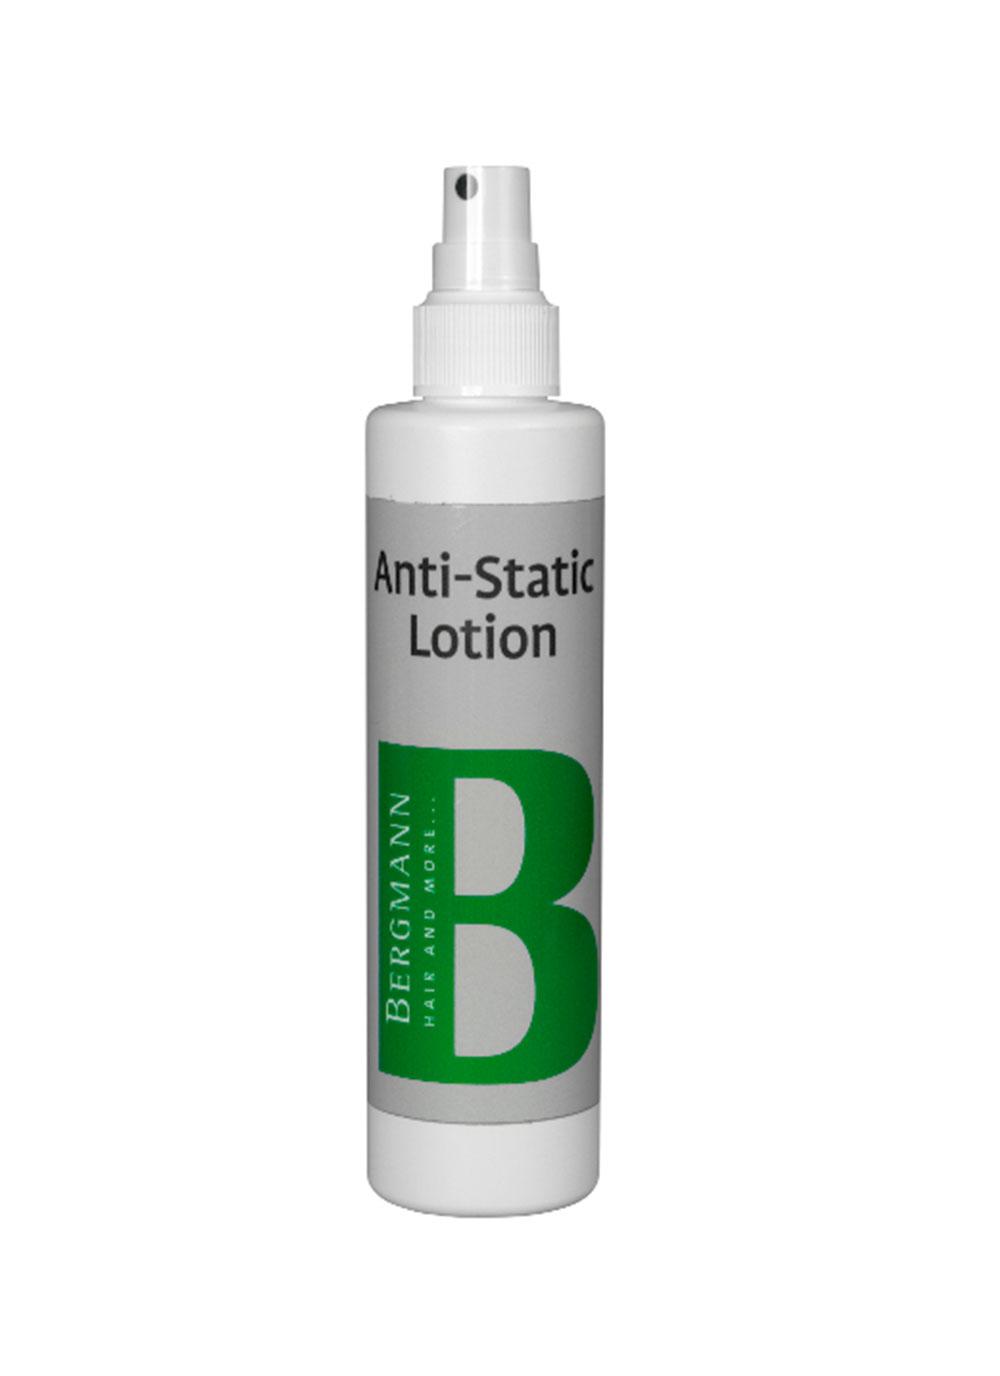 Bergmann Zubehör - Echthaar Anti-Static Lotion 200ml